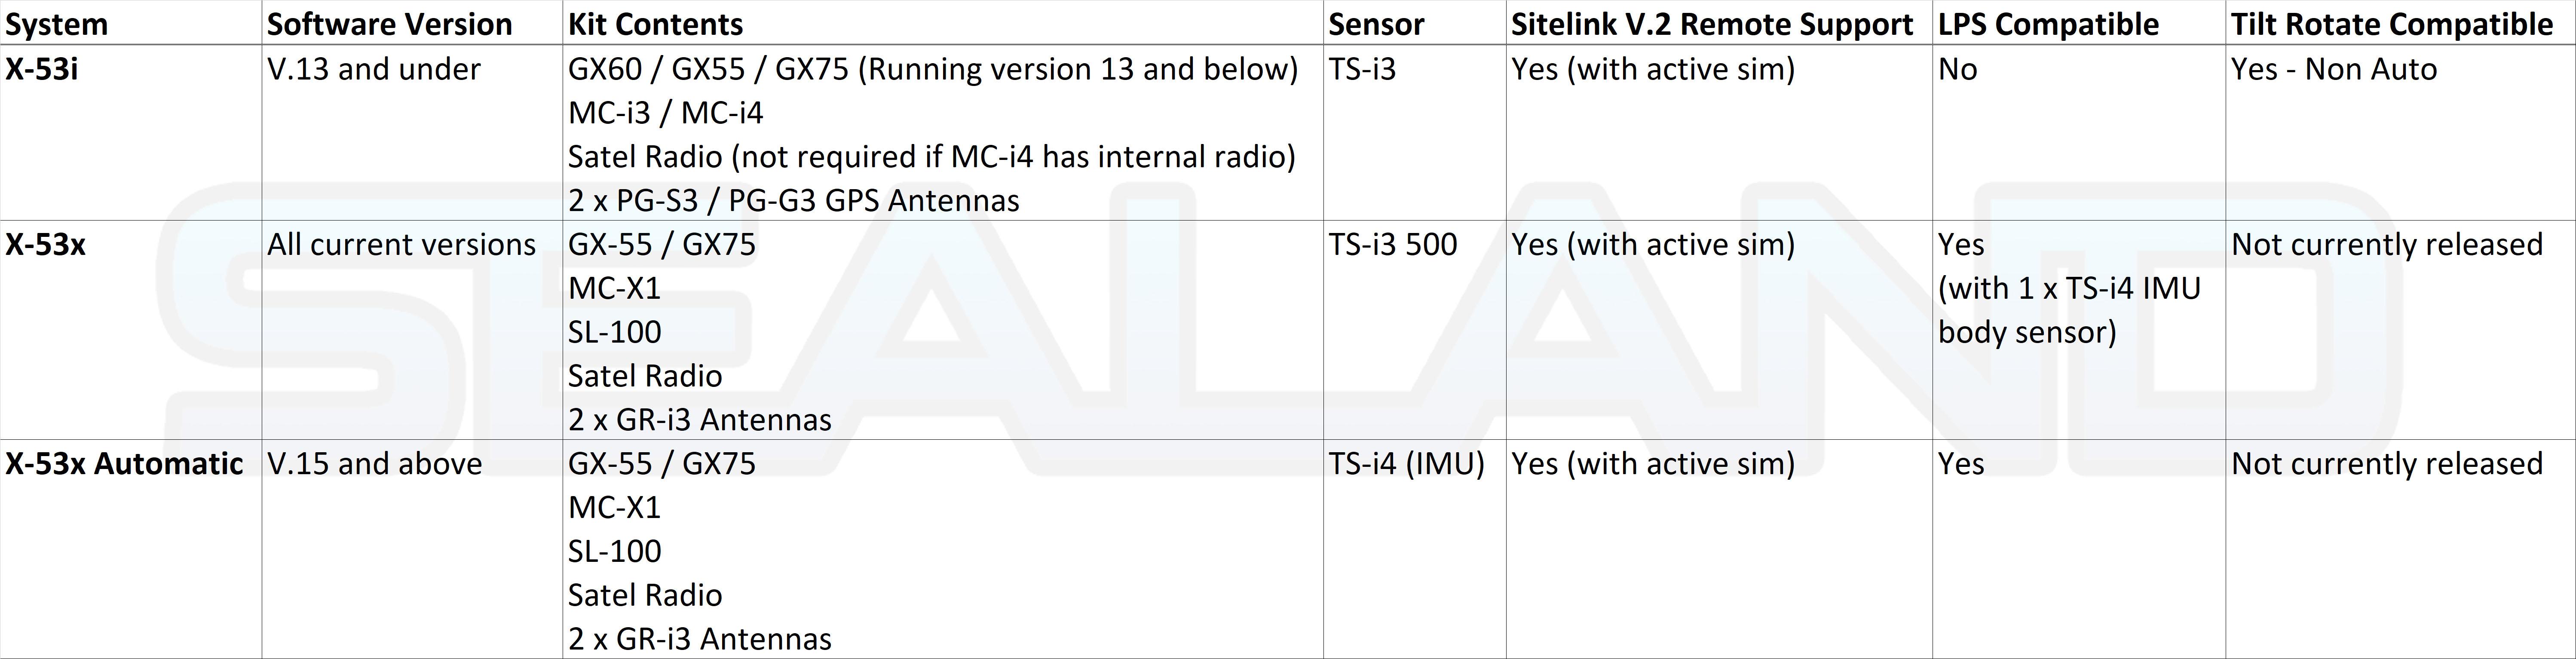 topcon-mc-system-difference-3.jpg